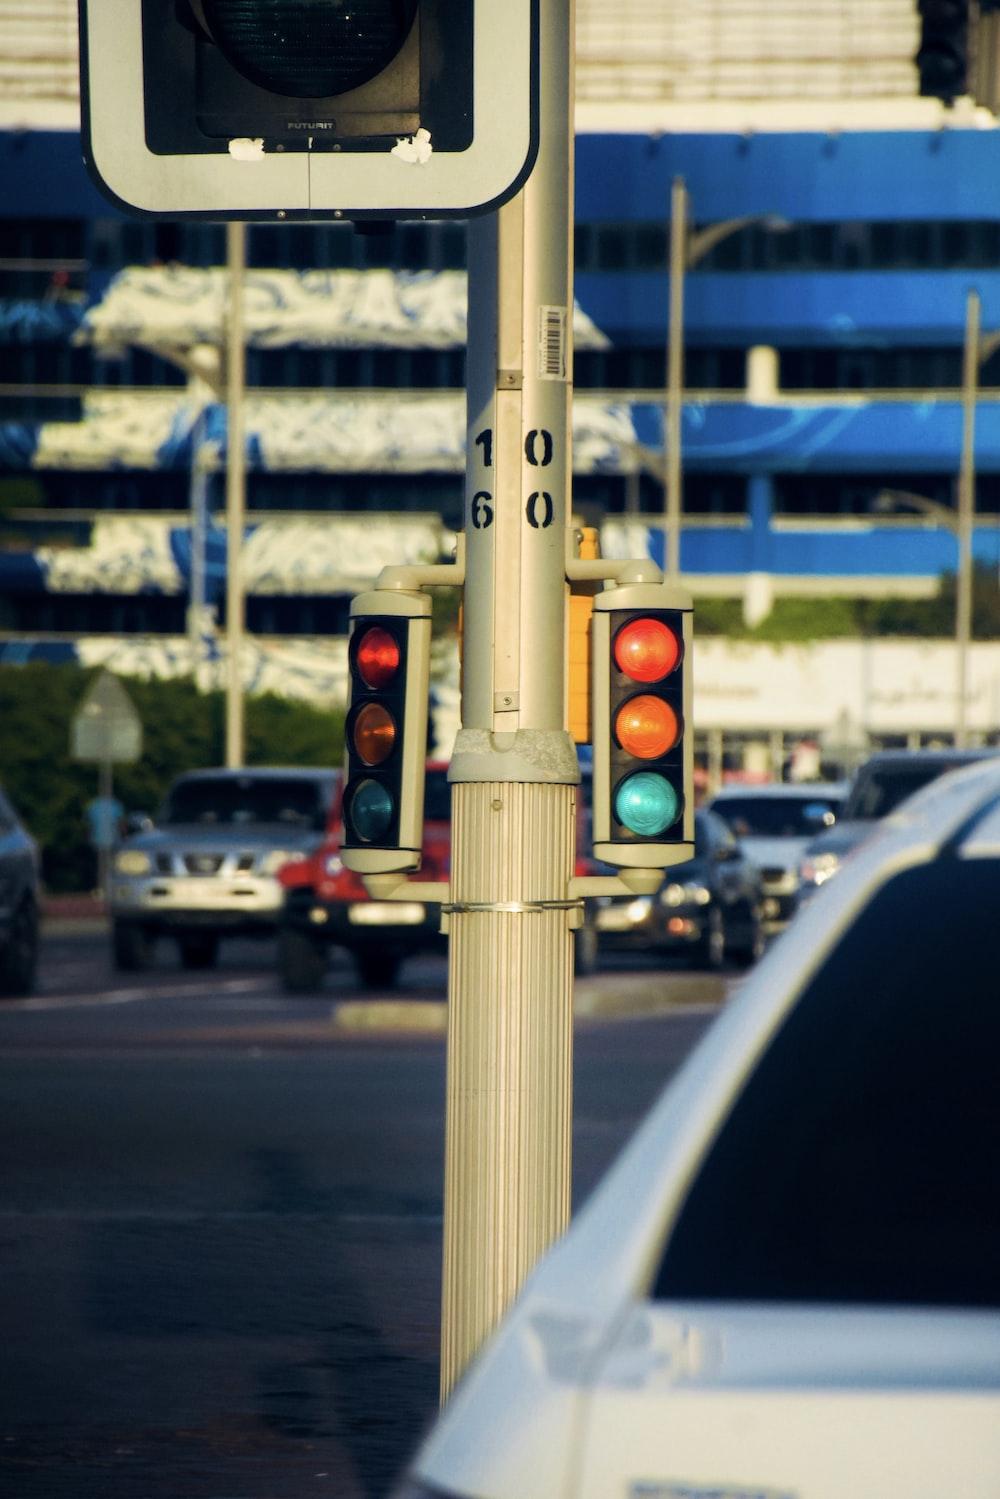 traffic light on red light